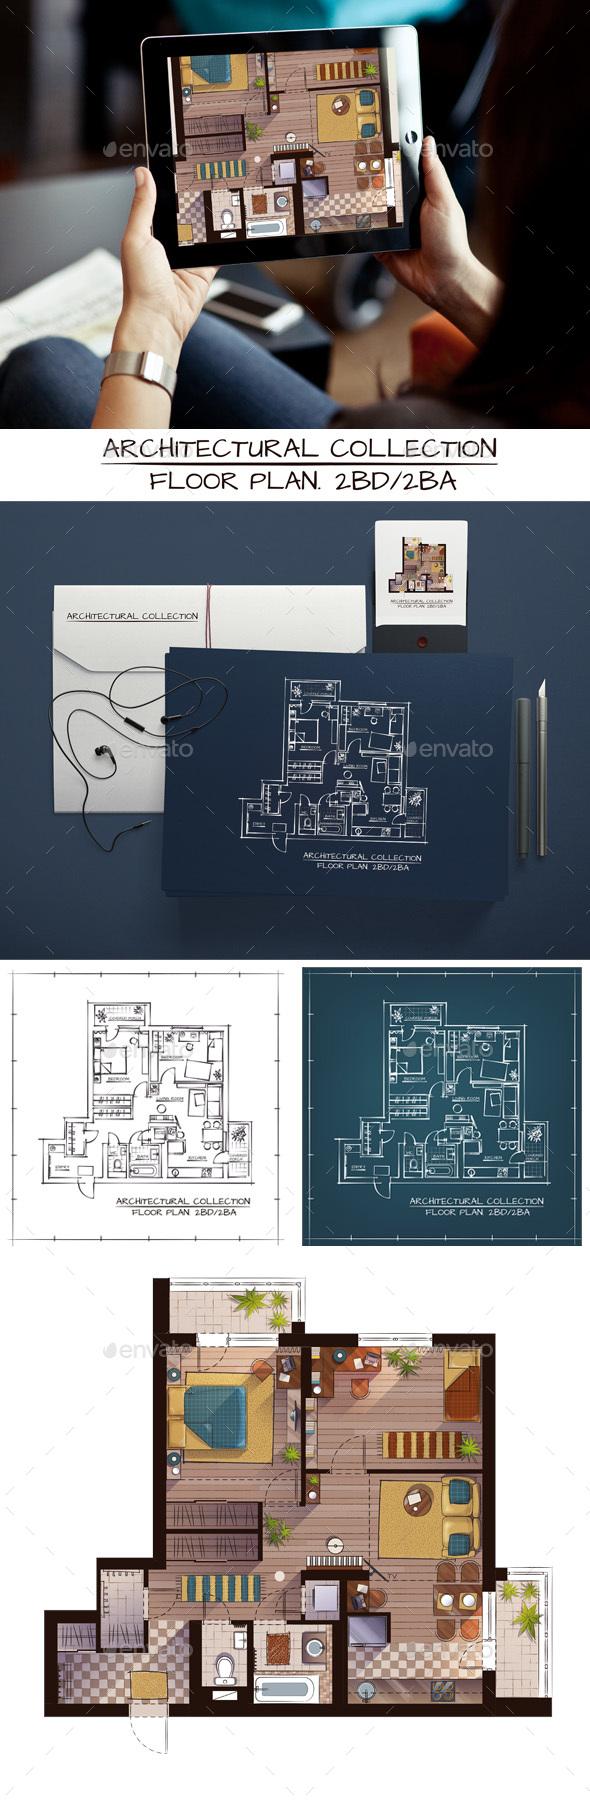 Architectural Sketch Color Floor Plan - Backgrounds Decorative